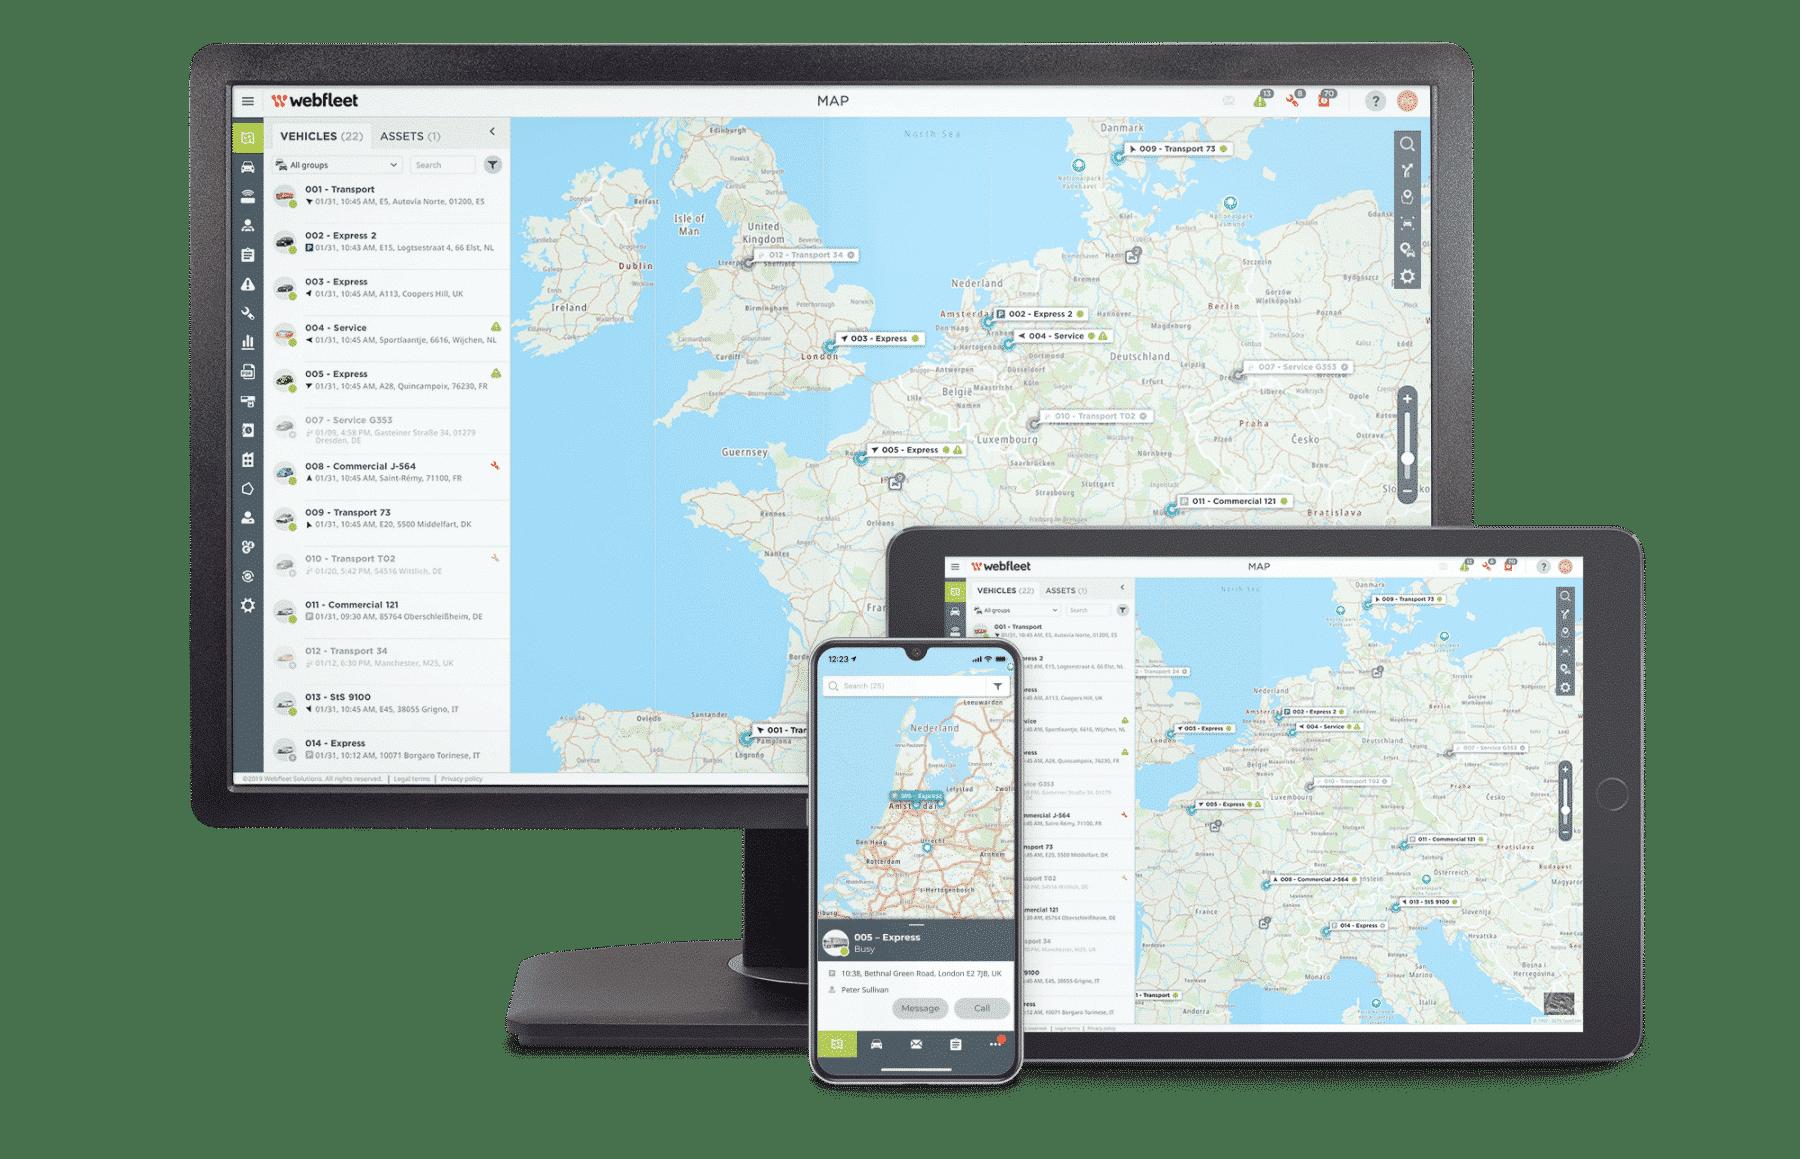 WEBFLEET® Telematikplattform Desktop und WEBFLEET Mobile